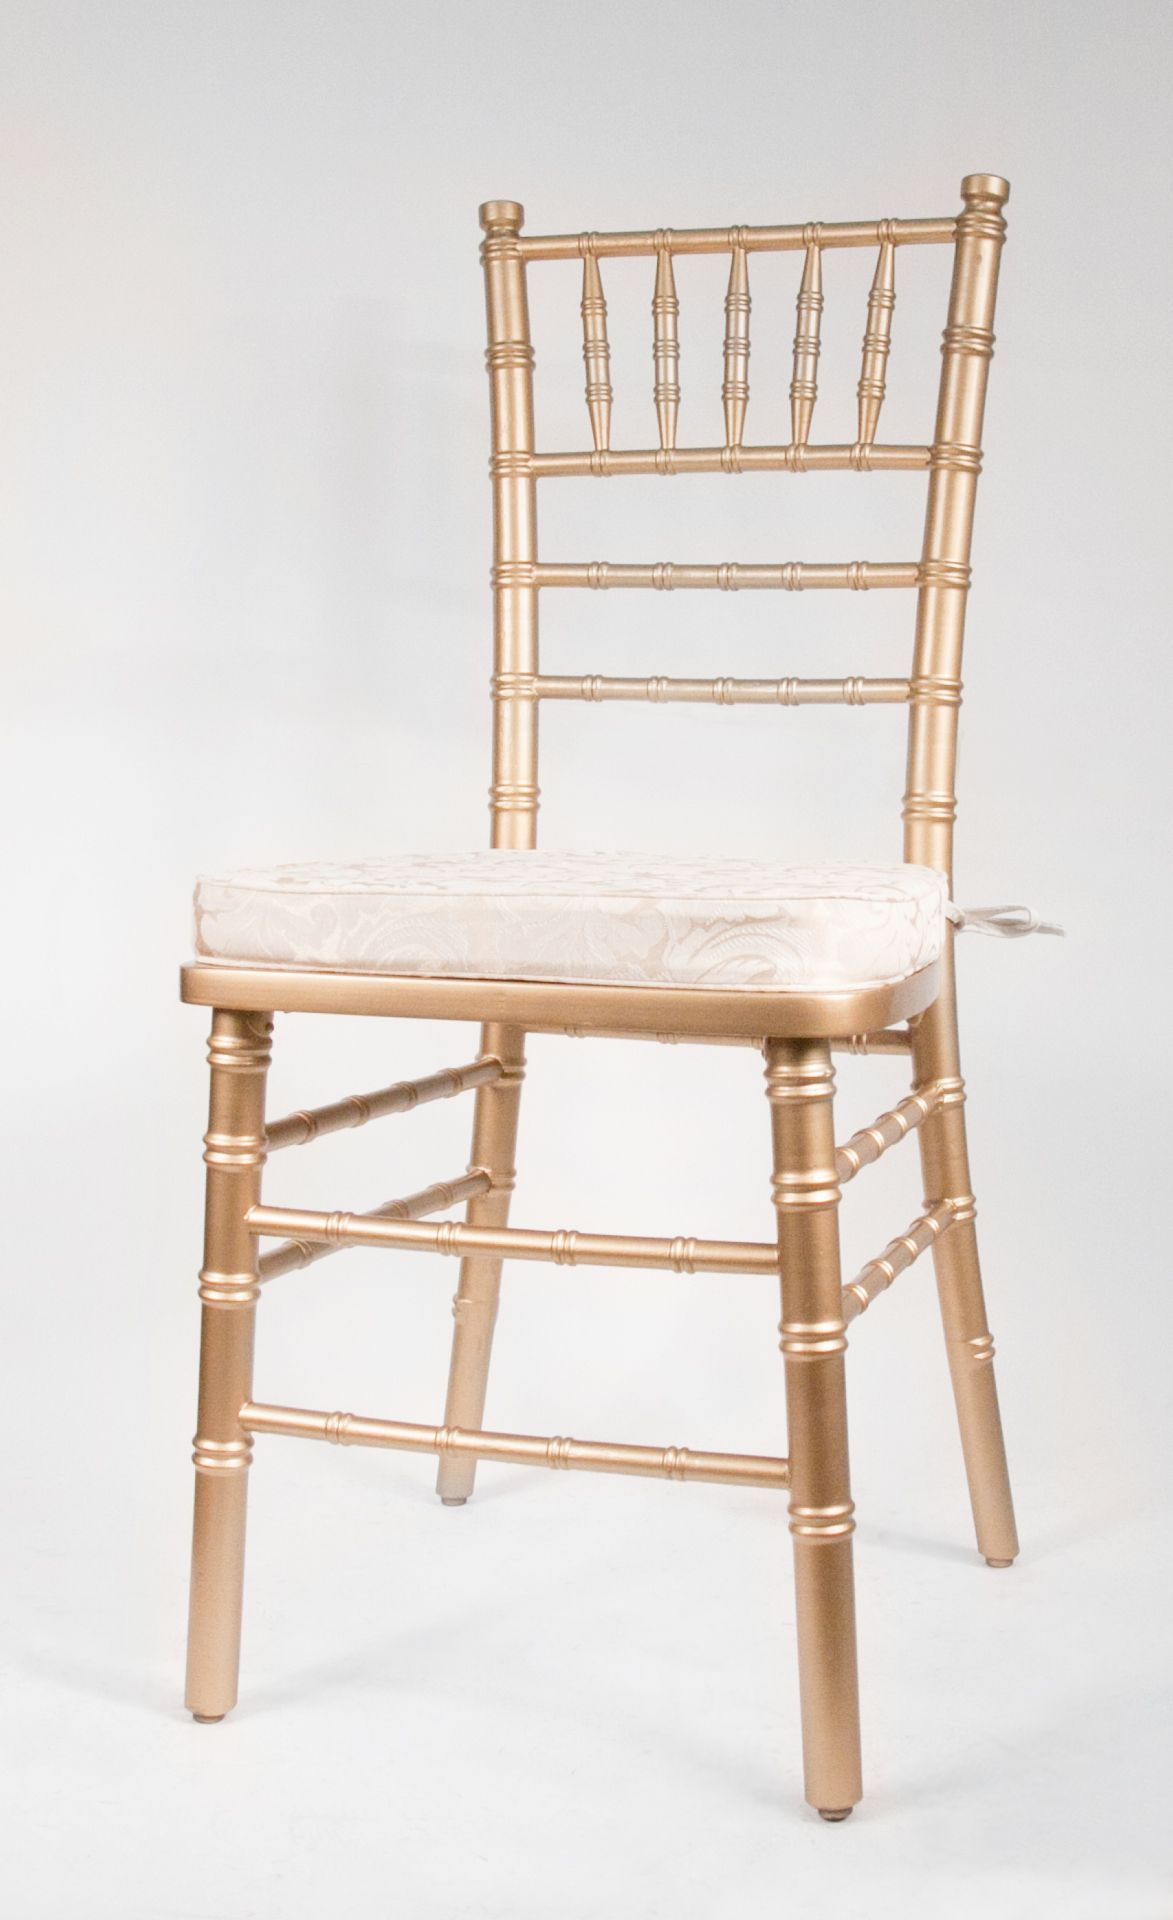 Vision Furniture Chiavari Ballroom Chairs Event Furniture Gold Chiavari Chairs Furniture Chair